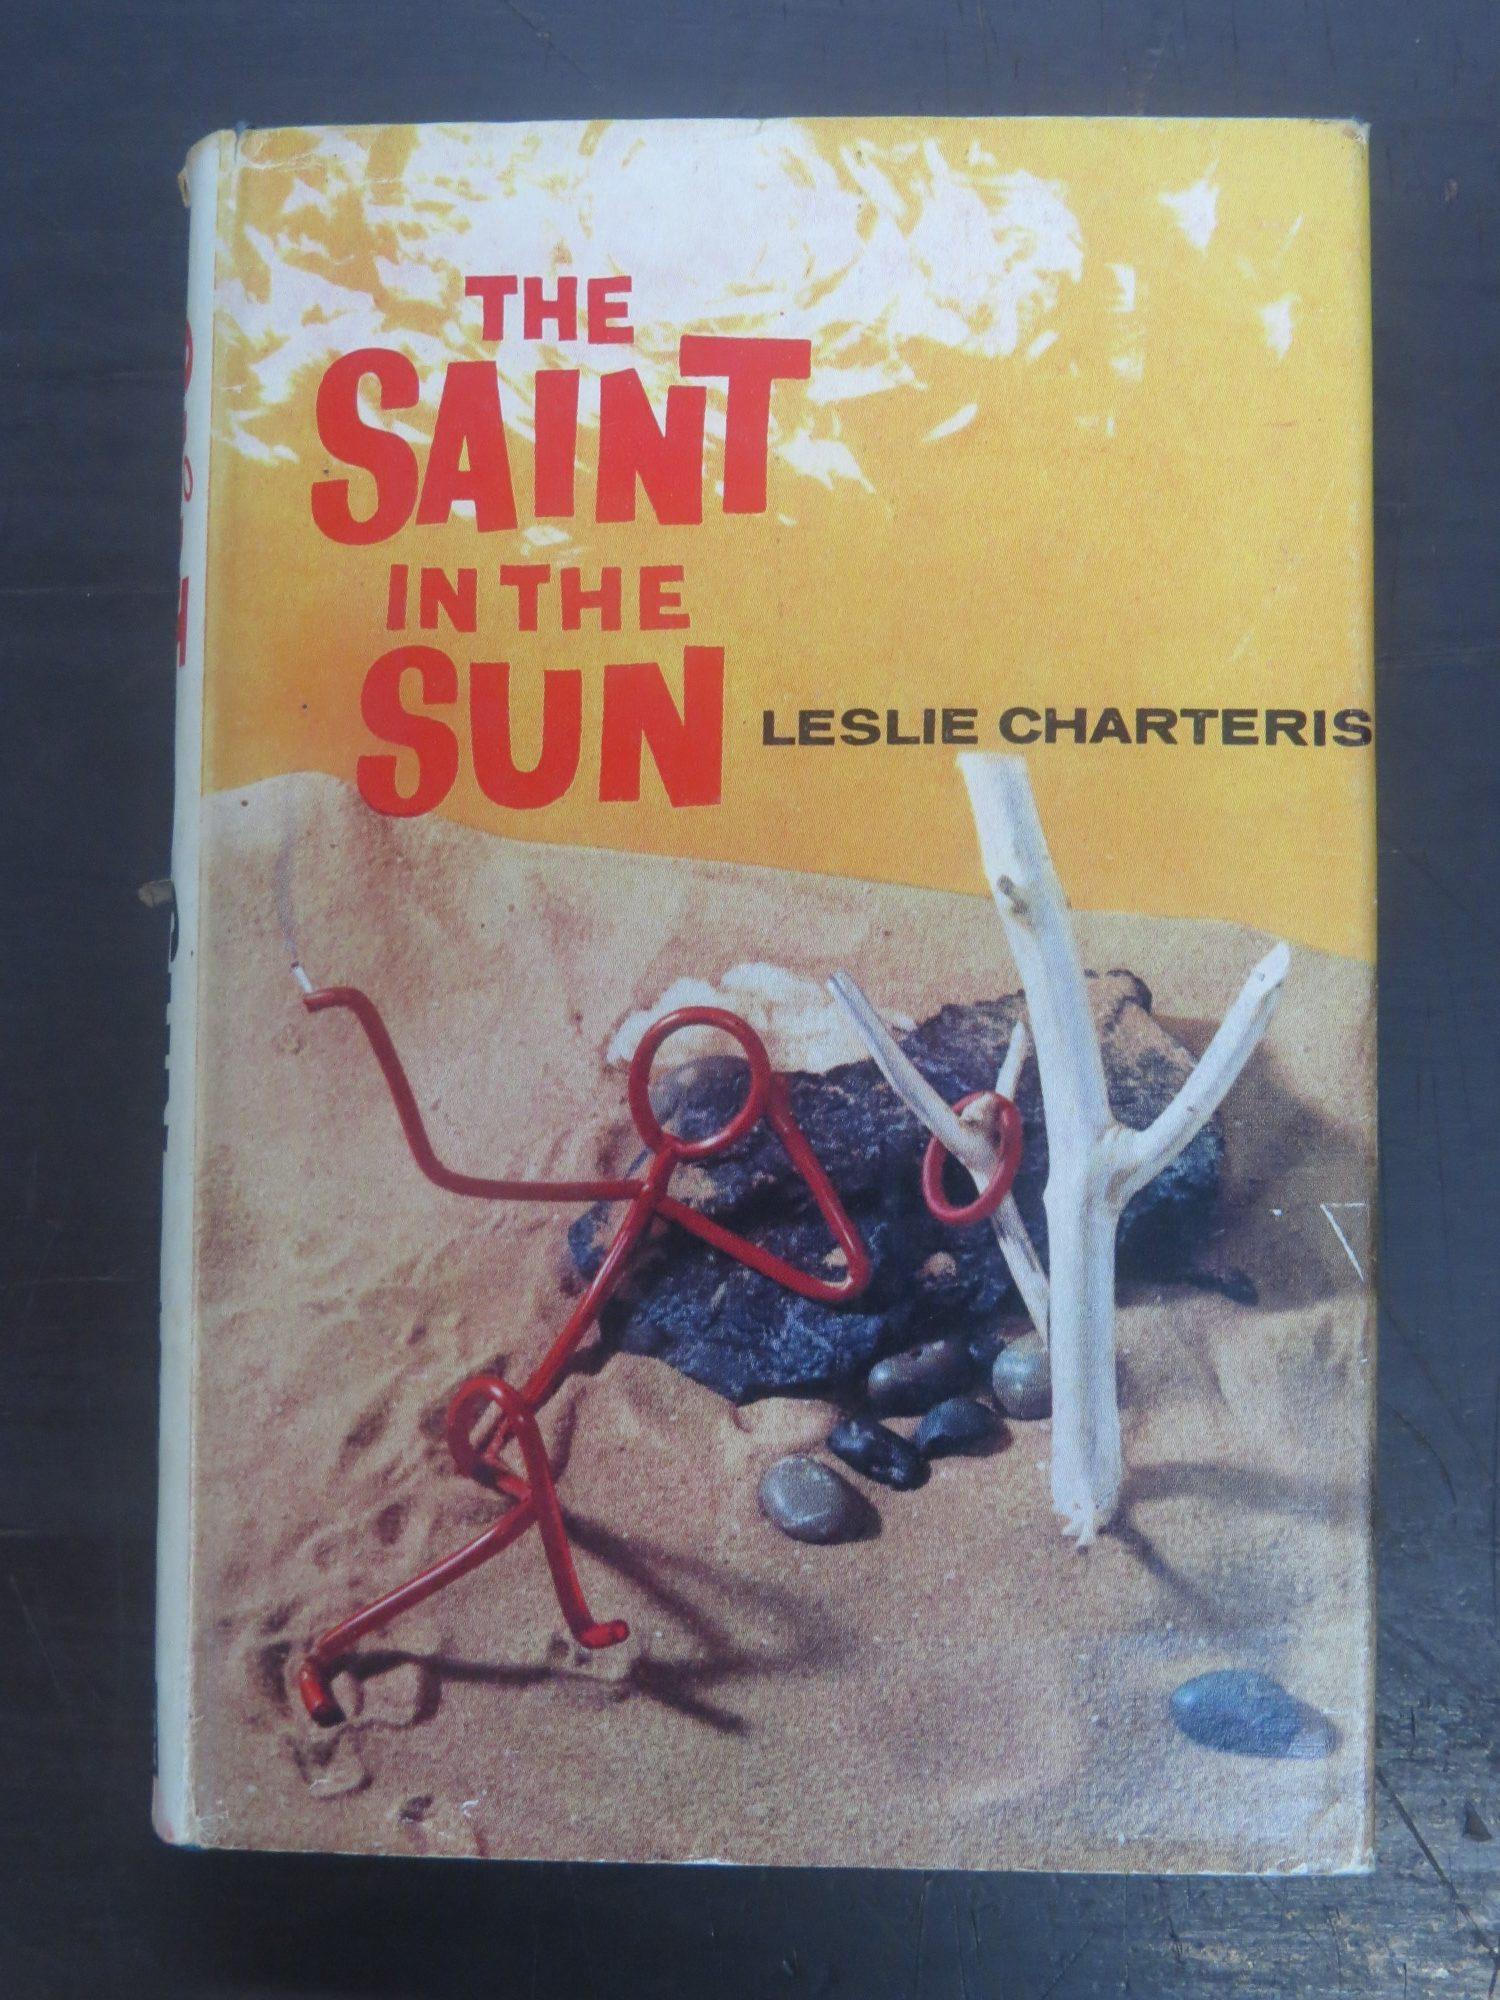 The Saint in the Sun